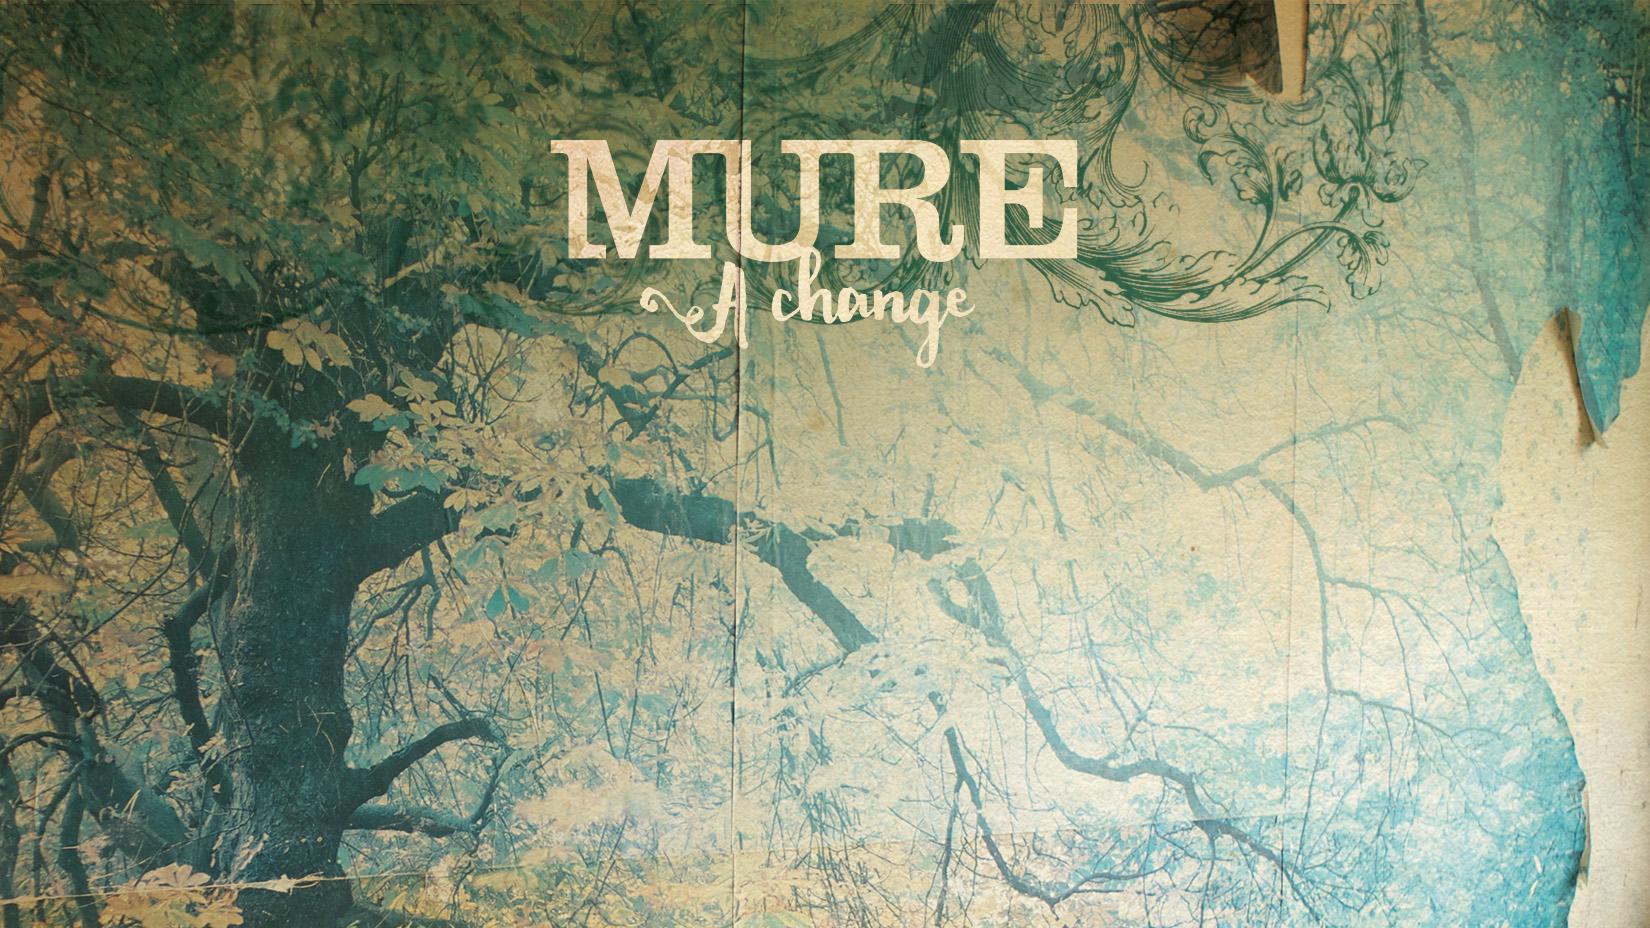 MURE-a_change-couv_digipack-1516734548.jpg